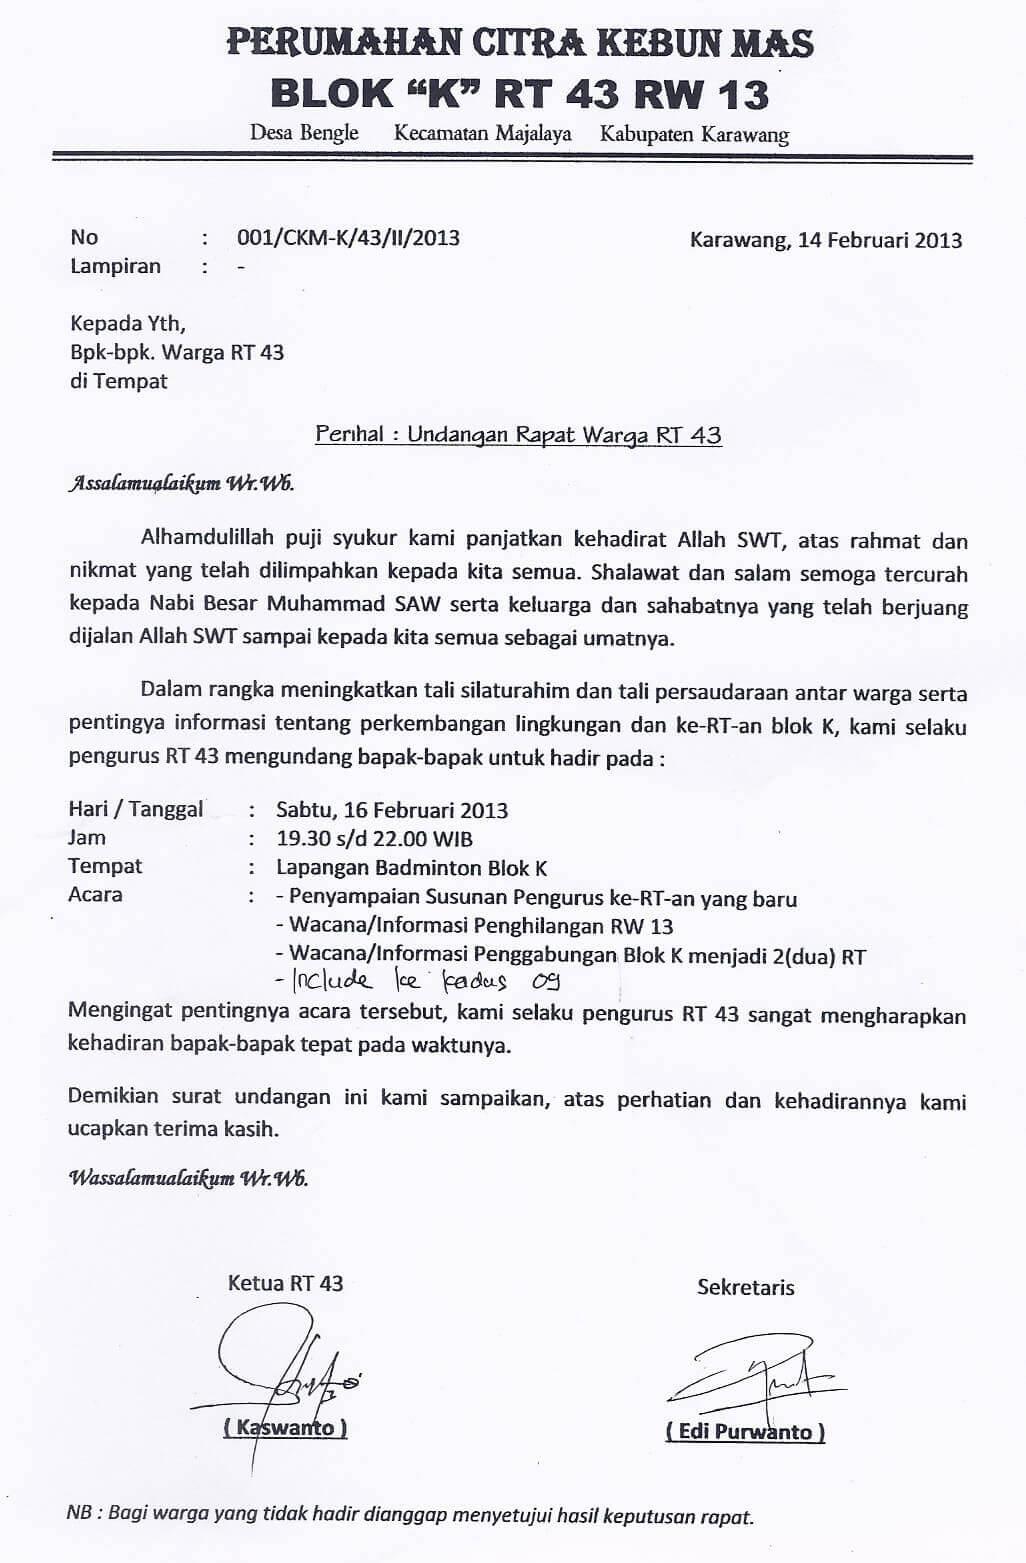 Contoh Surat Undangan Rapat Resmi Organisasi Contoh Surat